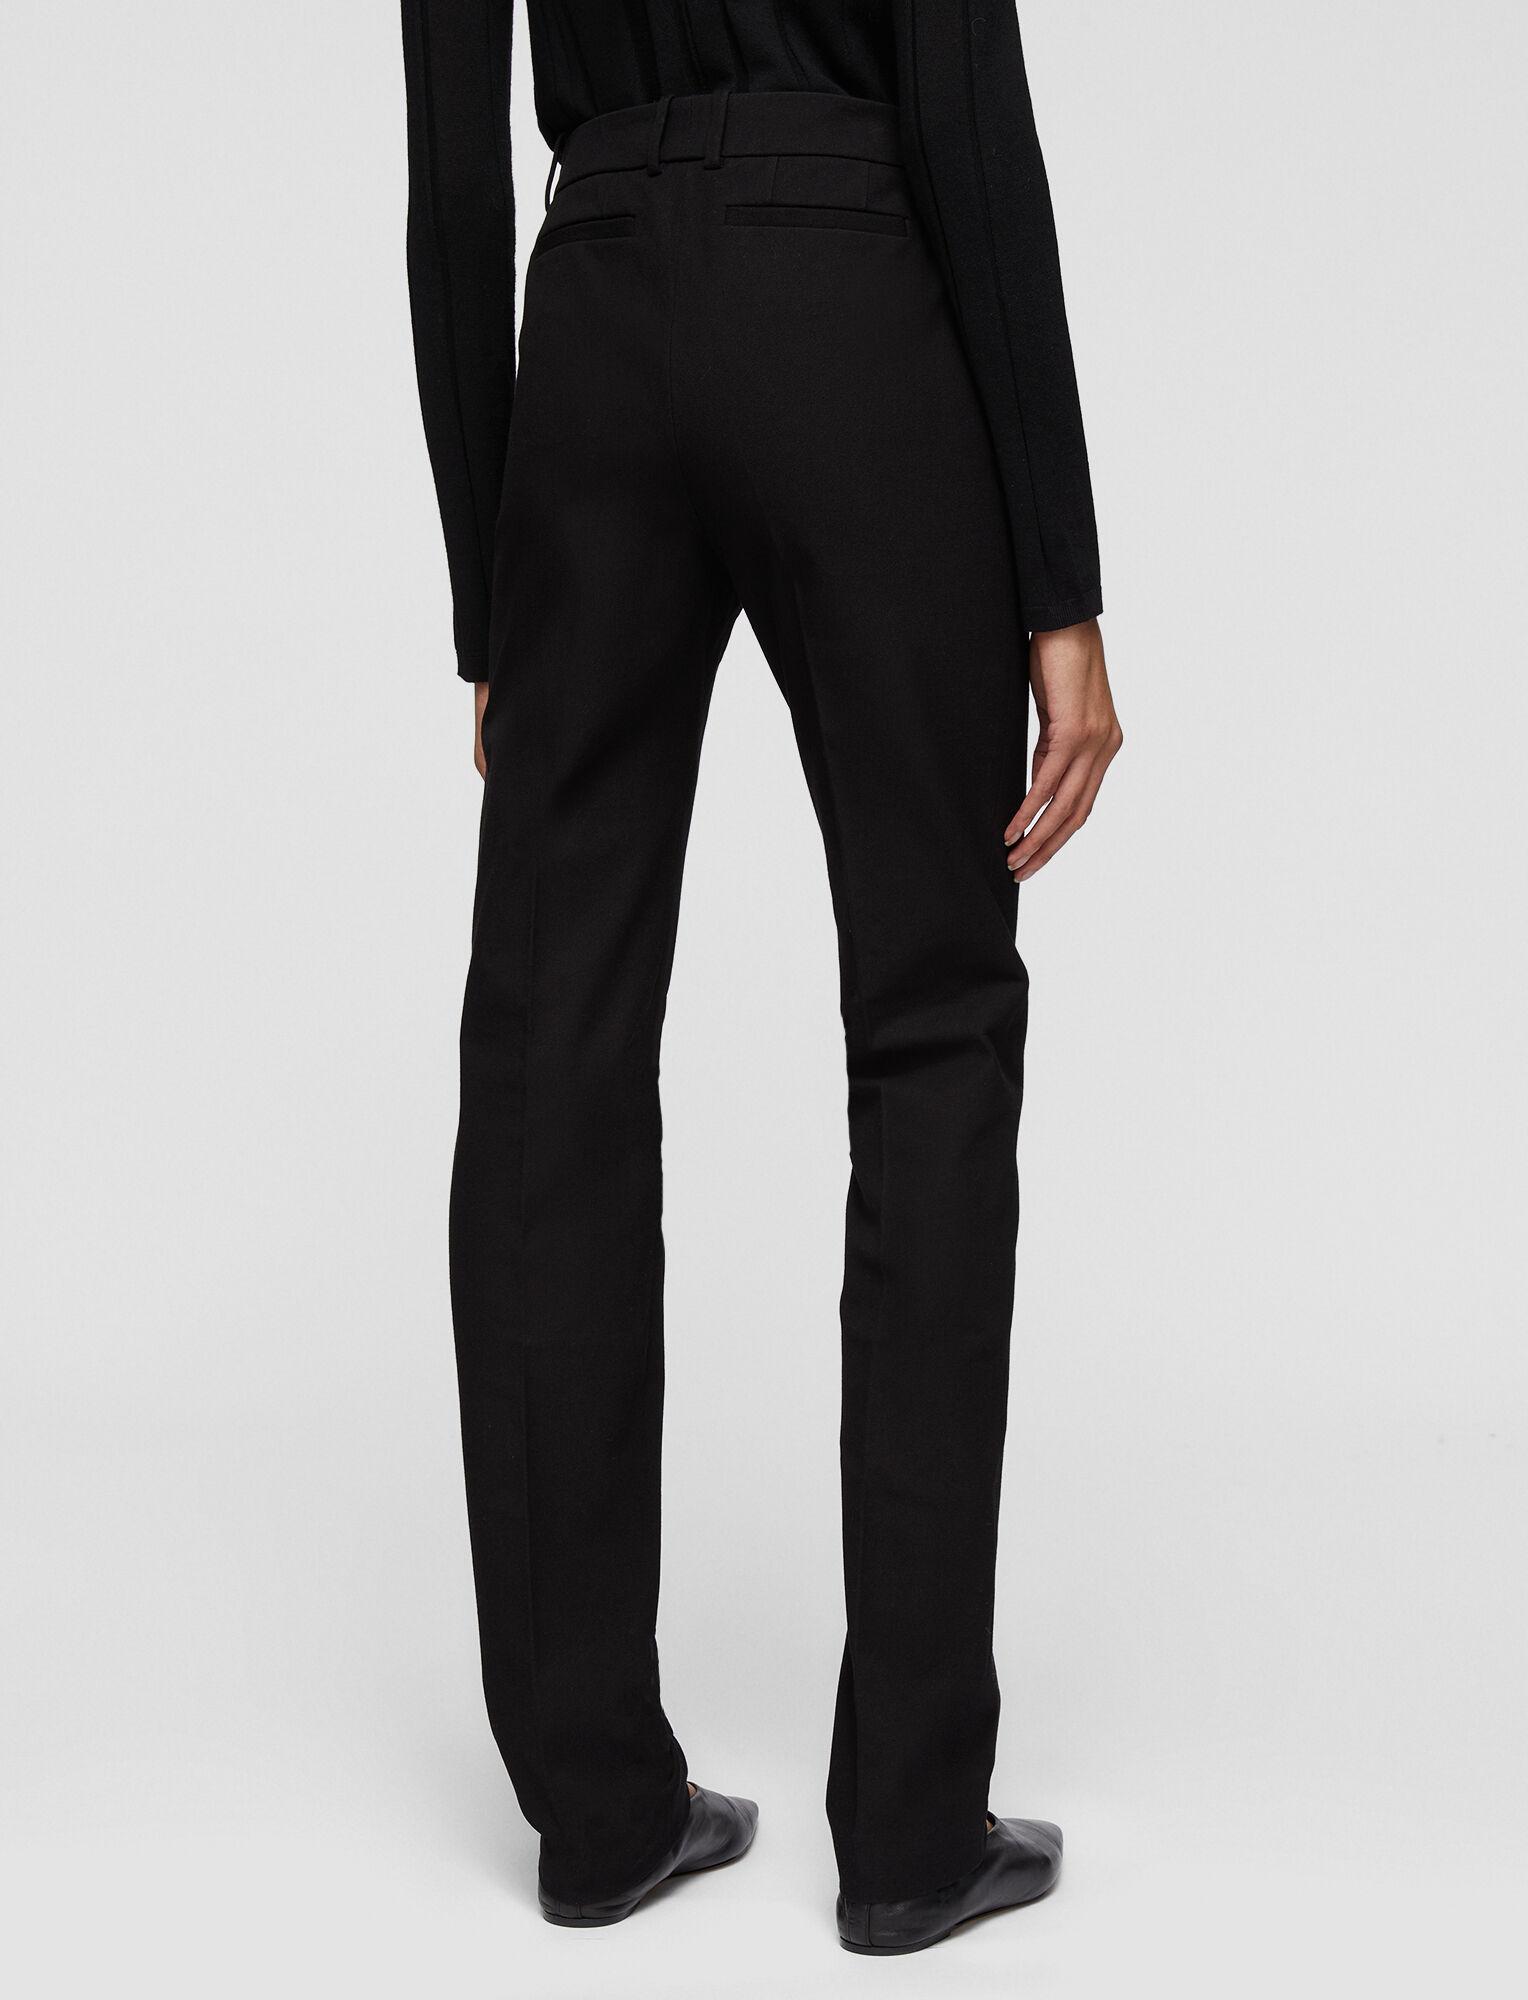 Joseph, Cole Gabardine Stretch Trousers, in BLACK